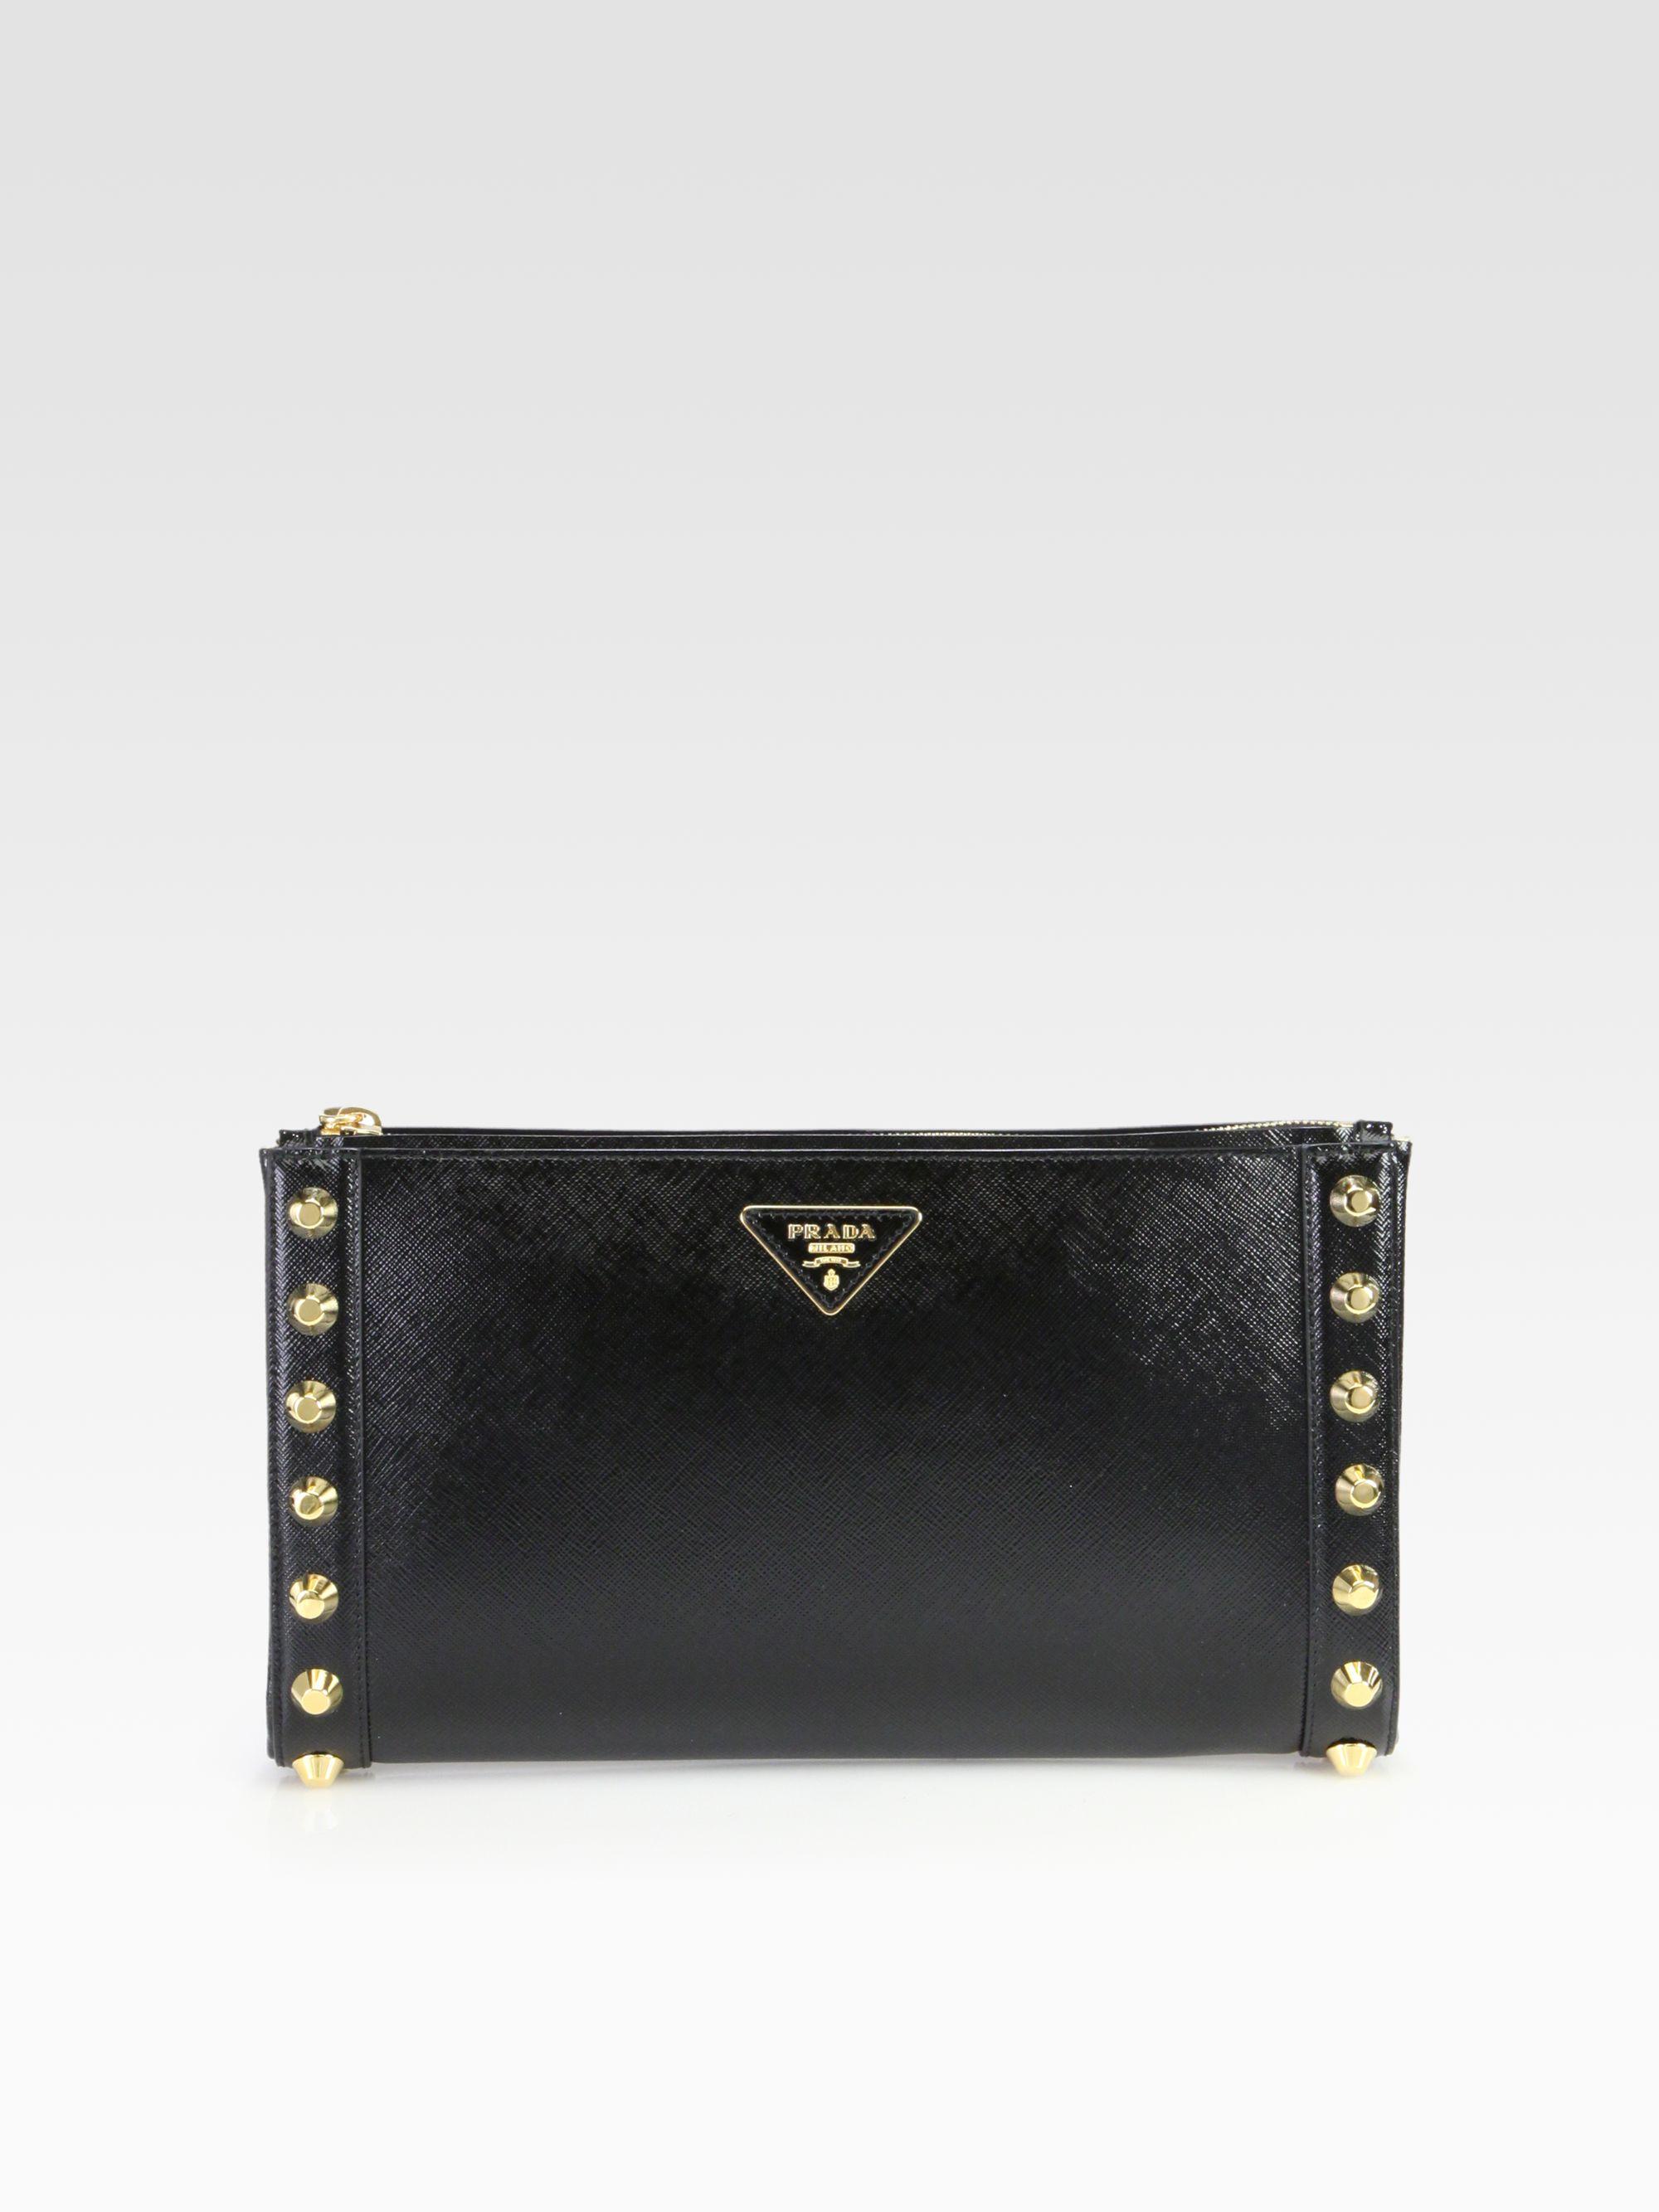 Prada Saffiano Vernice Studded Clutch in Black | Lyst